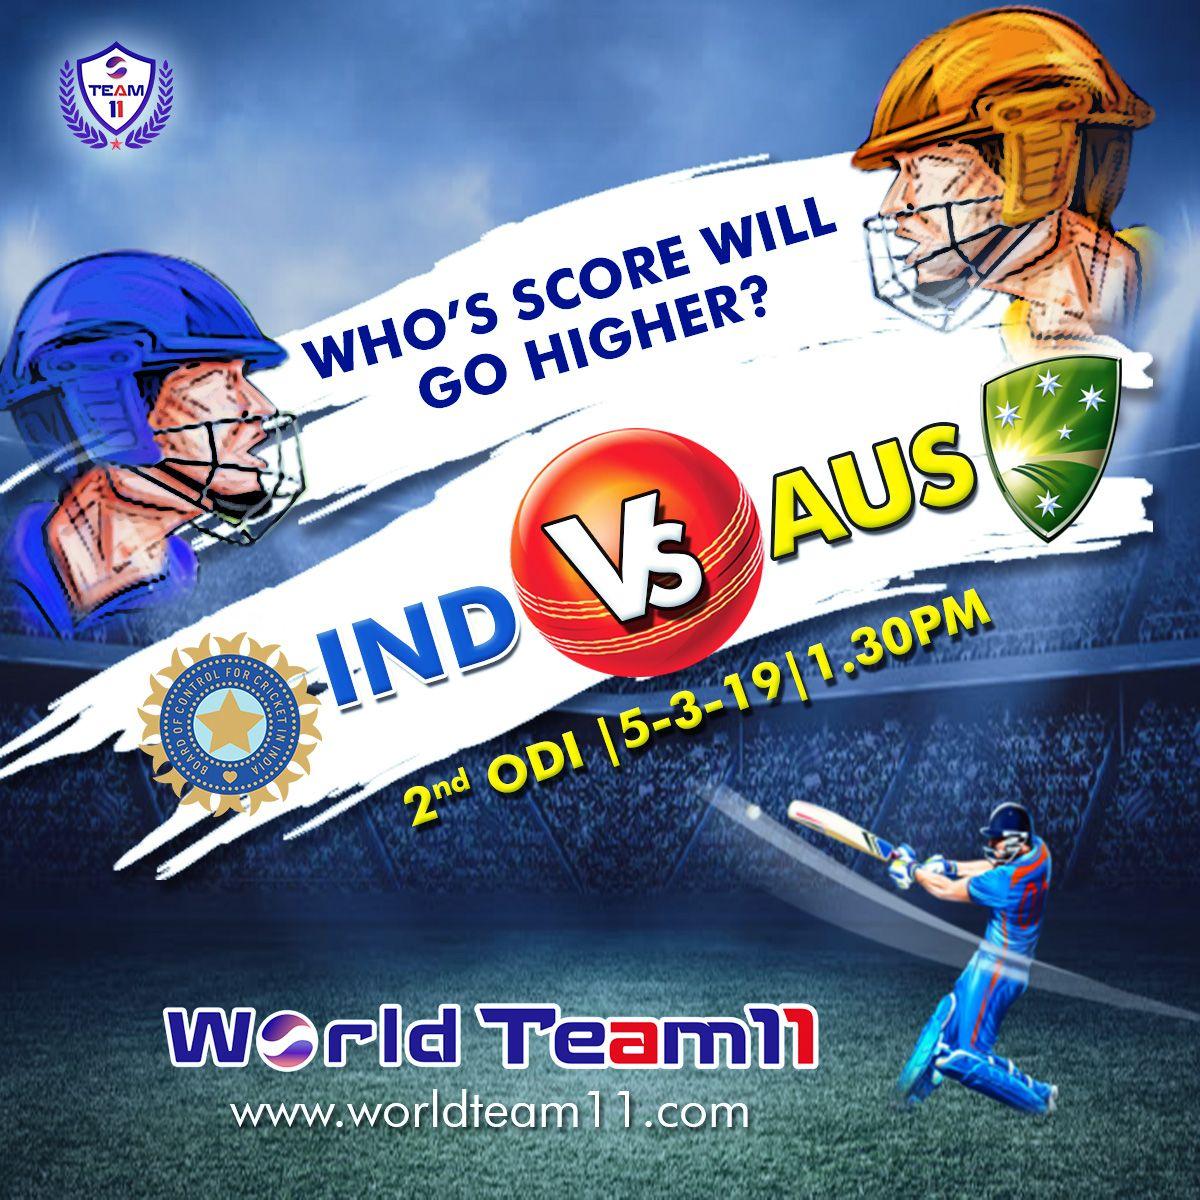 India vs Australia 2nd ODI Hurray! You have got a chance